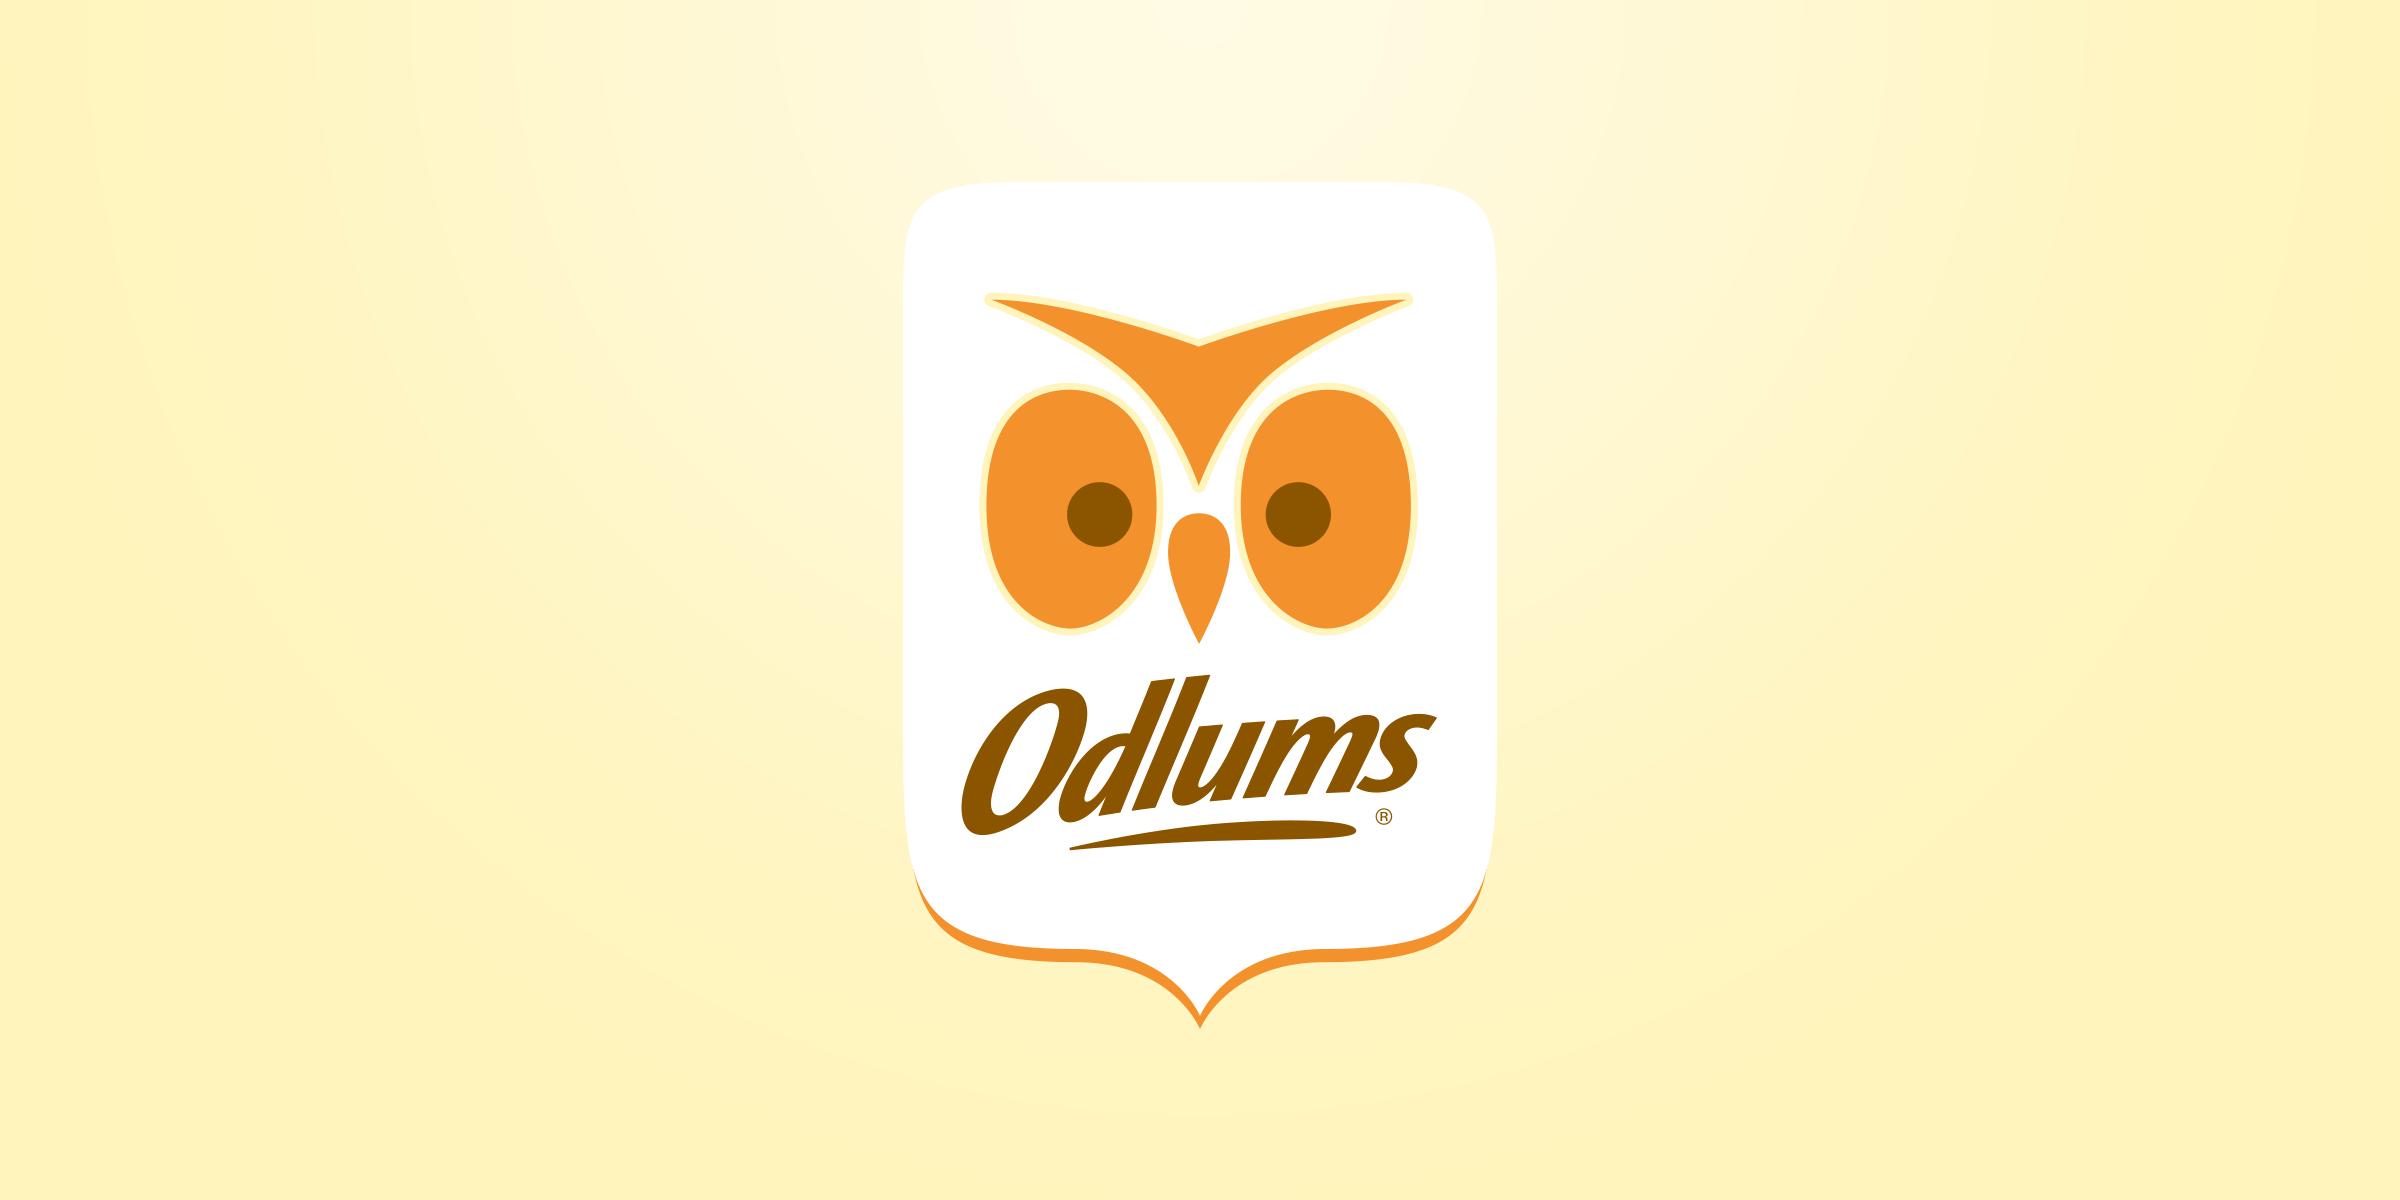 Odlums Brand Identity Refresh